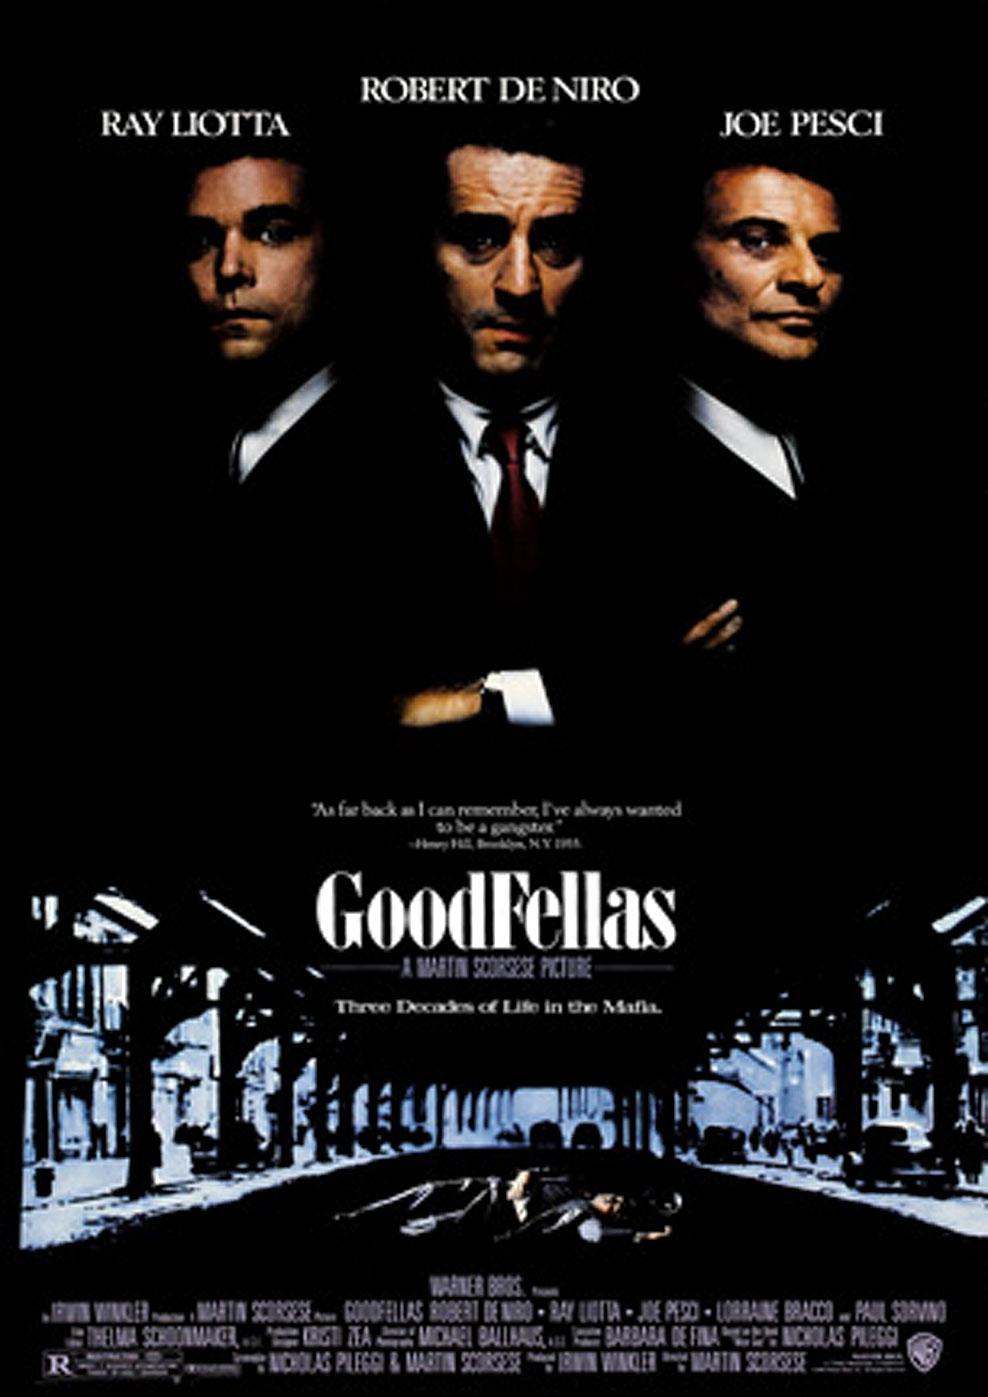 Good Fellas – Drei Jahrzehnte In Der Mafia